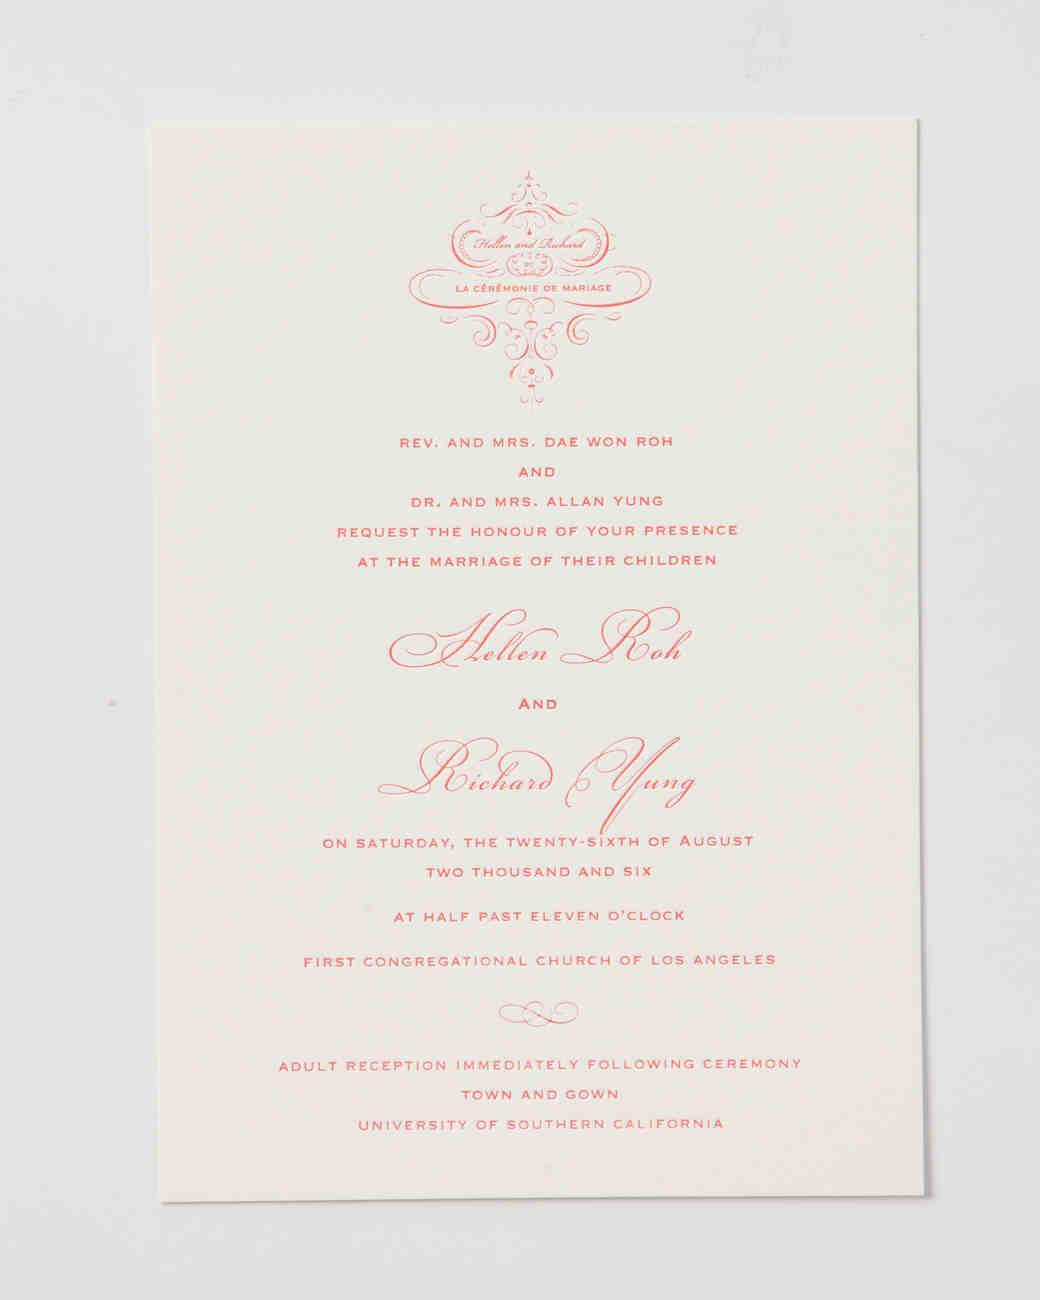 host-lines-weddings-stationery-8-reverend-doctor-0546-d111607-1014.jpg